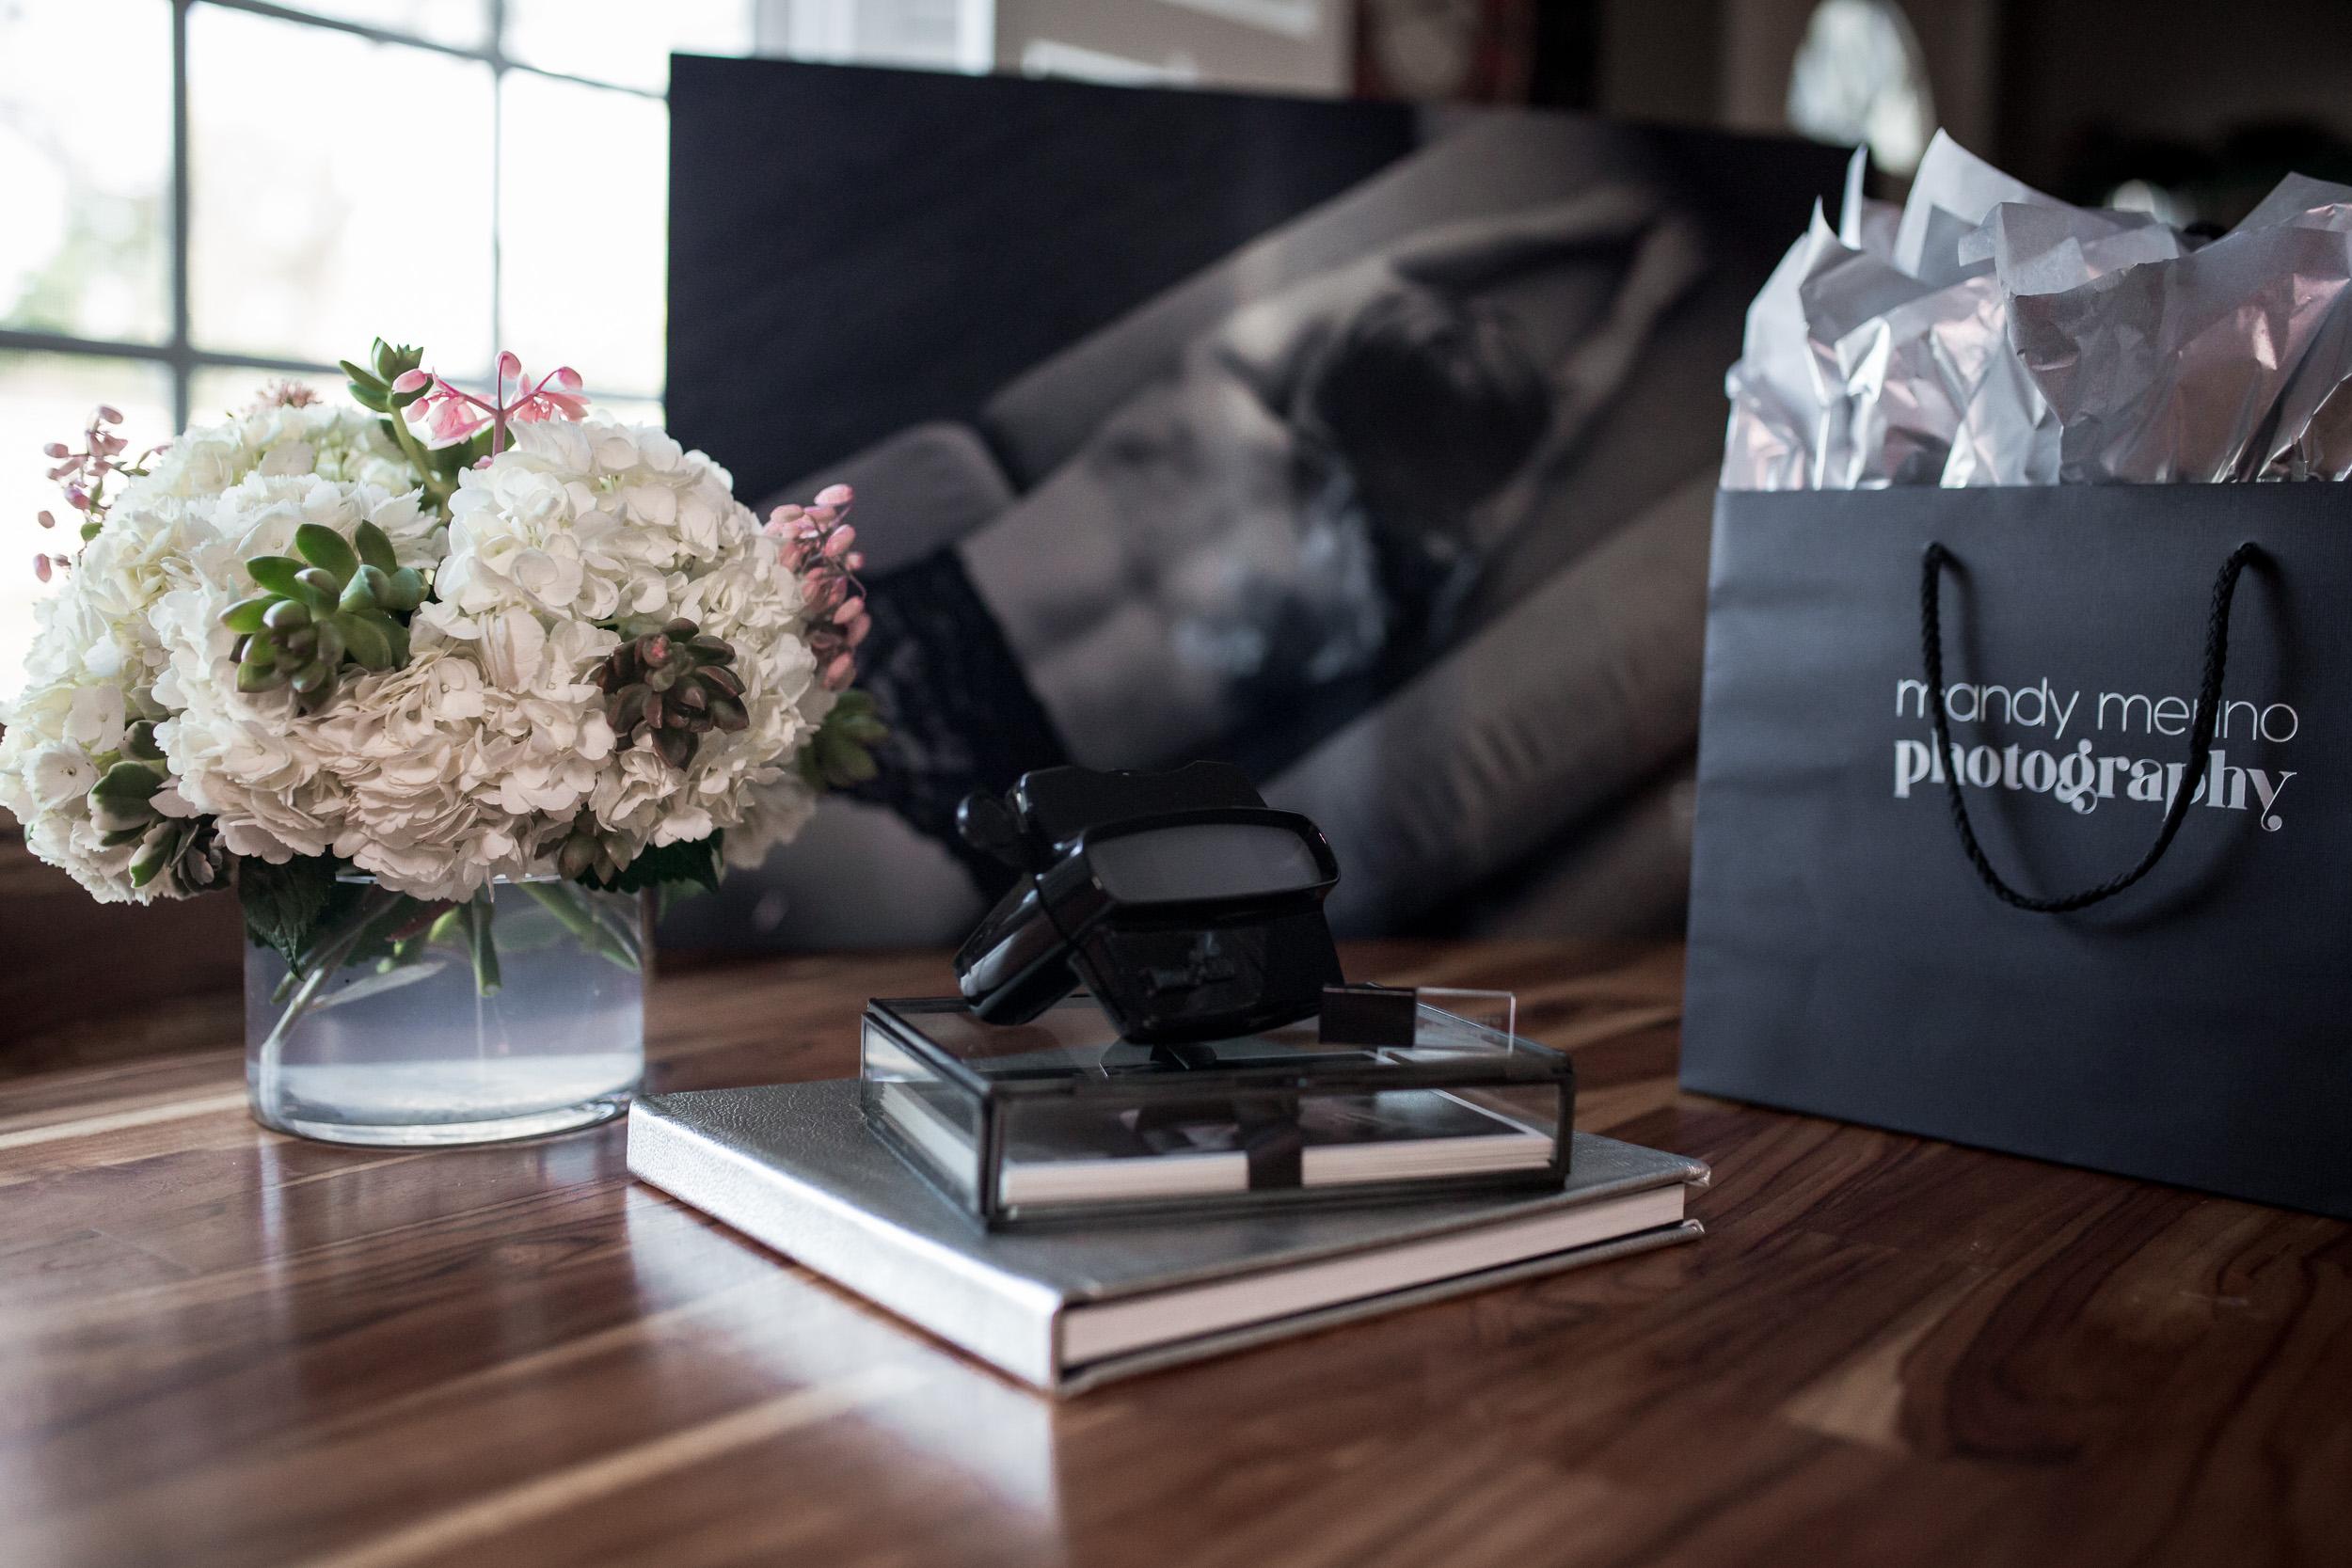 fullerton-boudoir-photo-products-4282.jpg